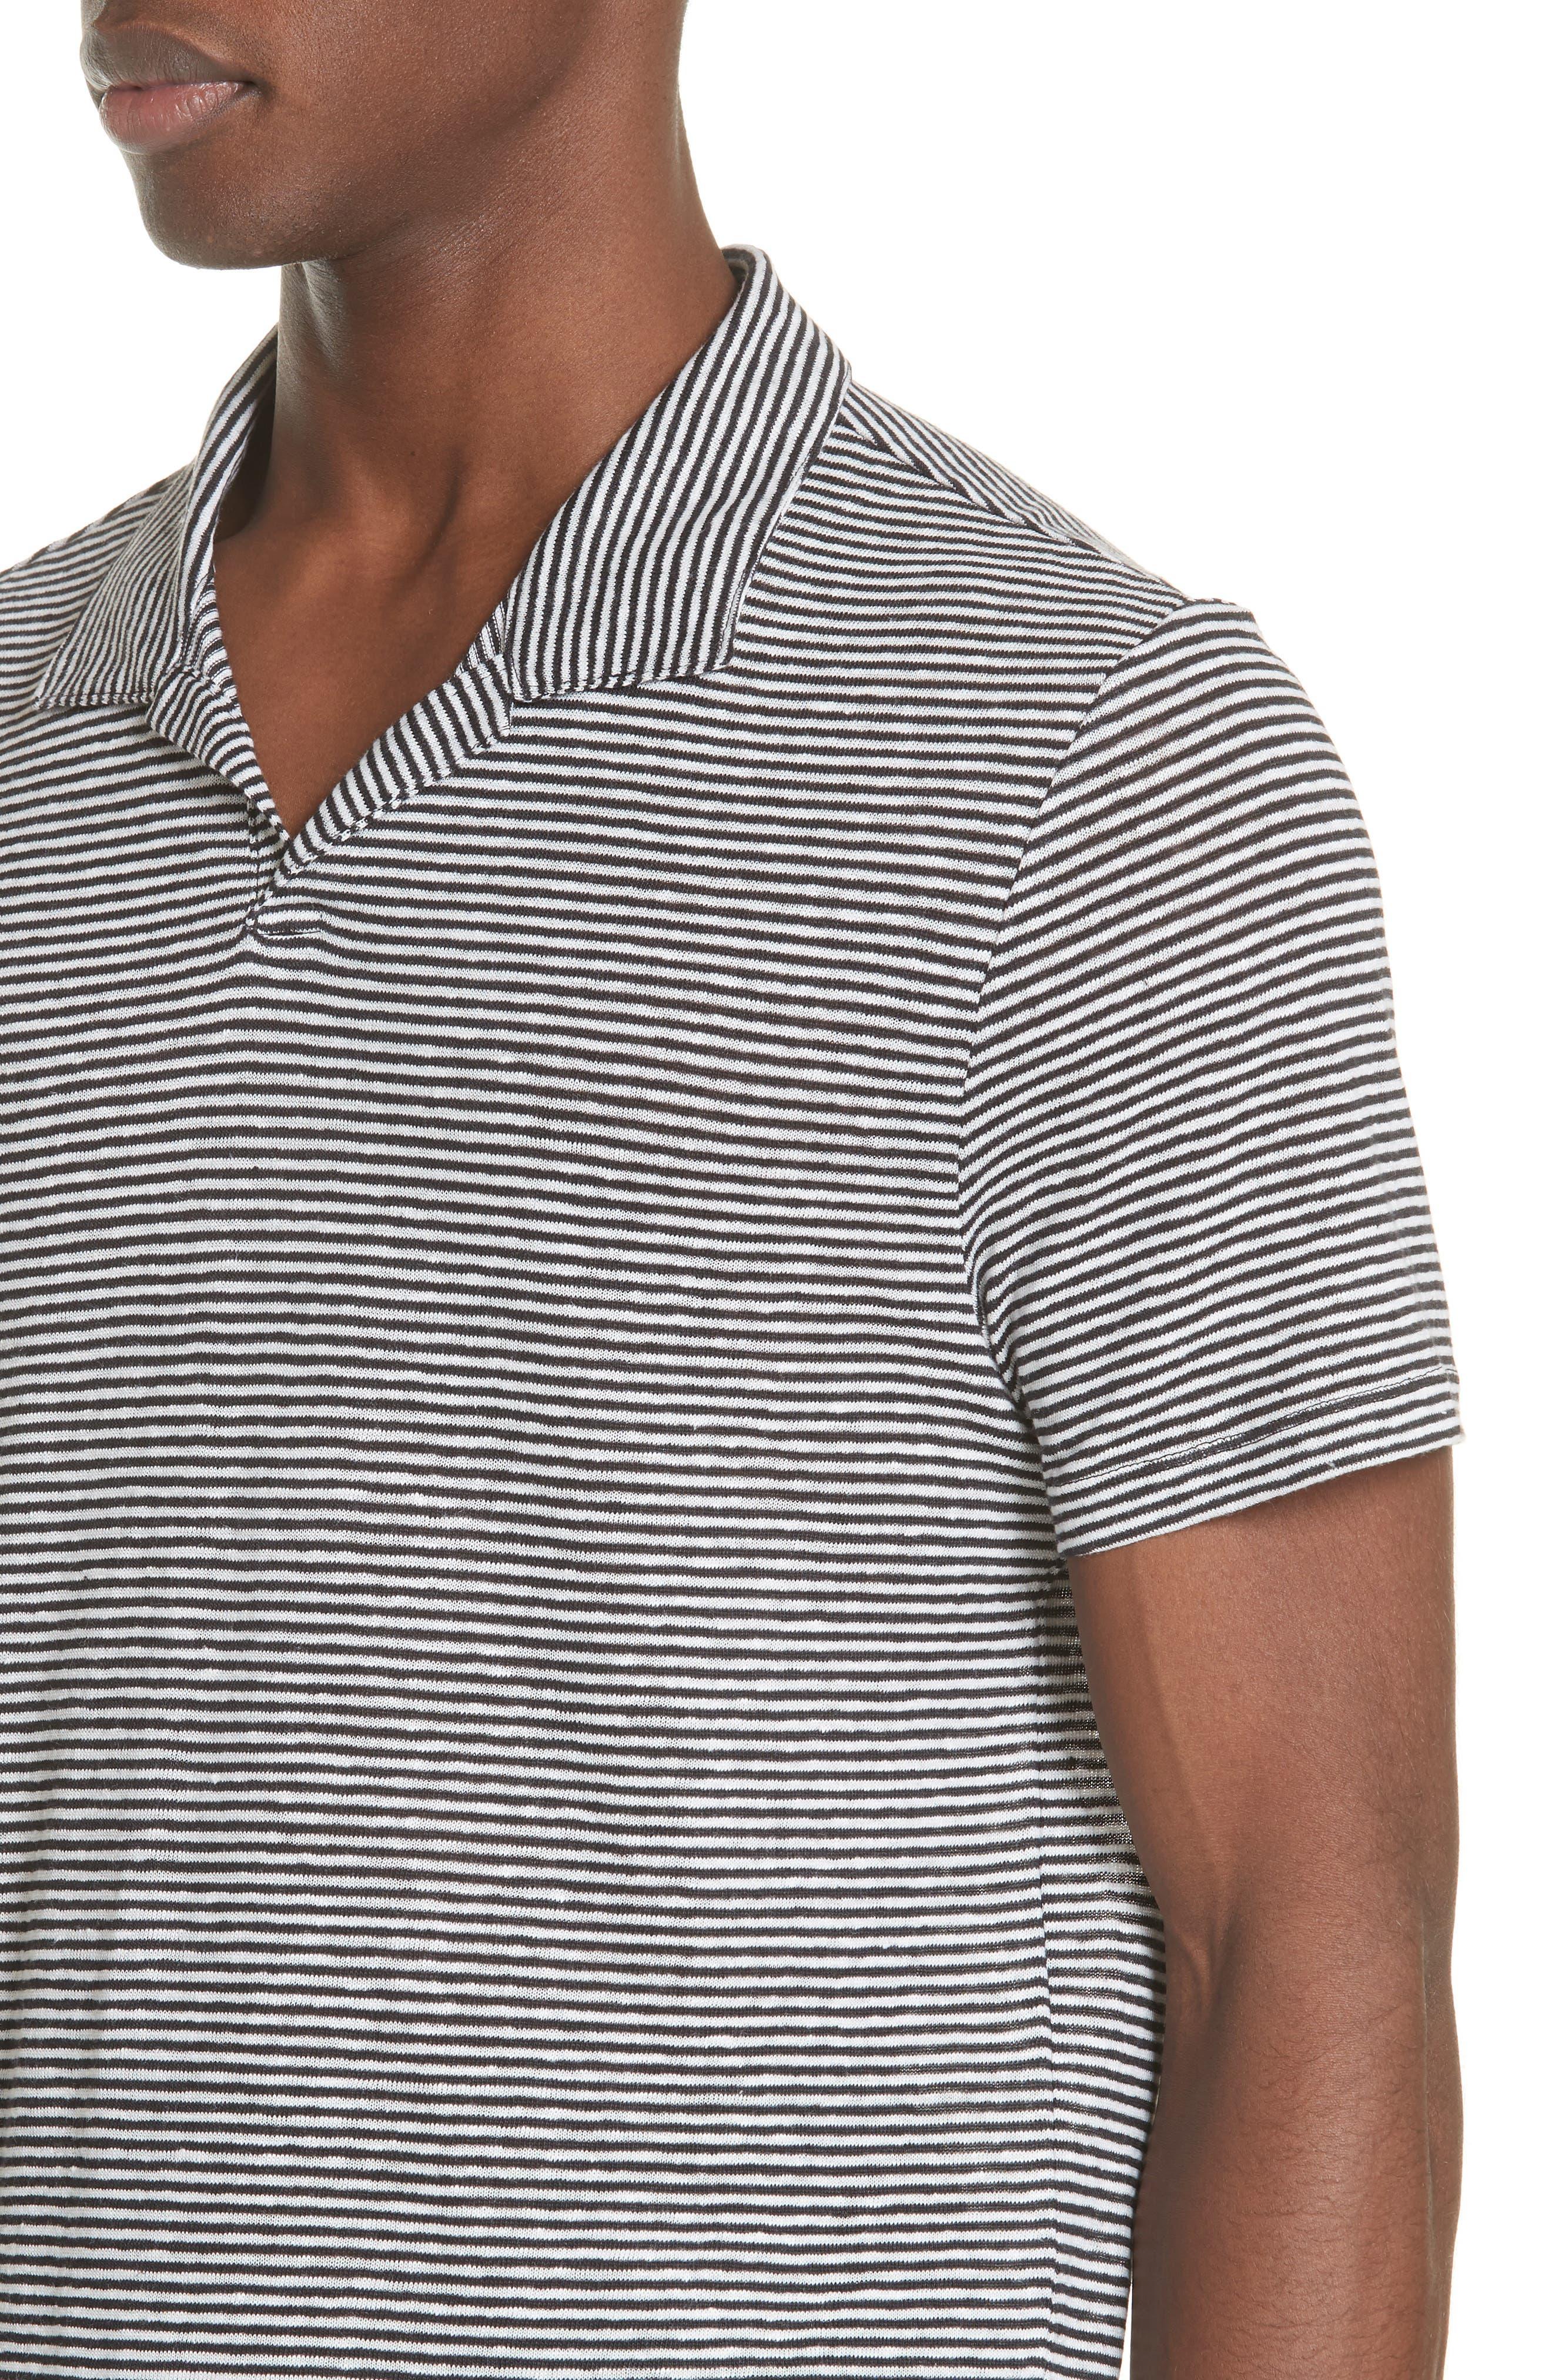 Shaun Stripe Polo,                             Alternate thumbnail 4, color,                             Black/ White